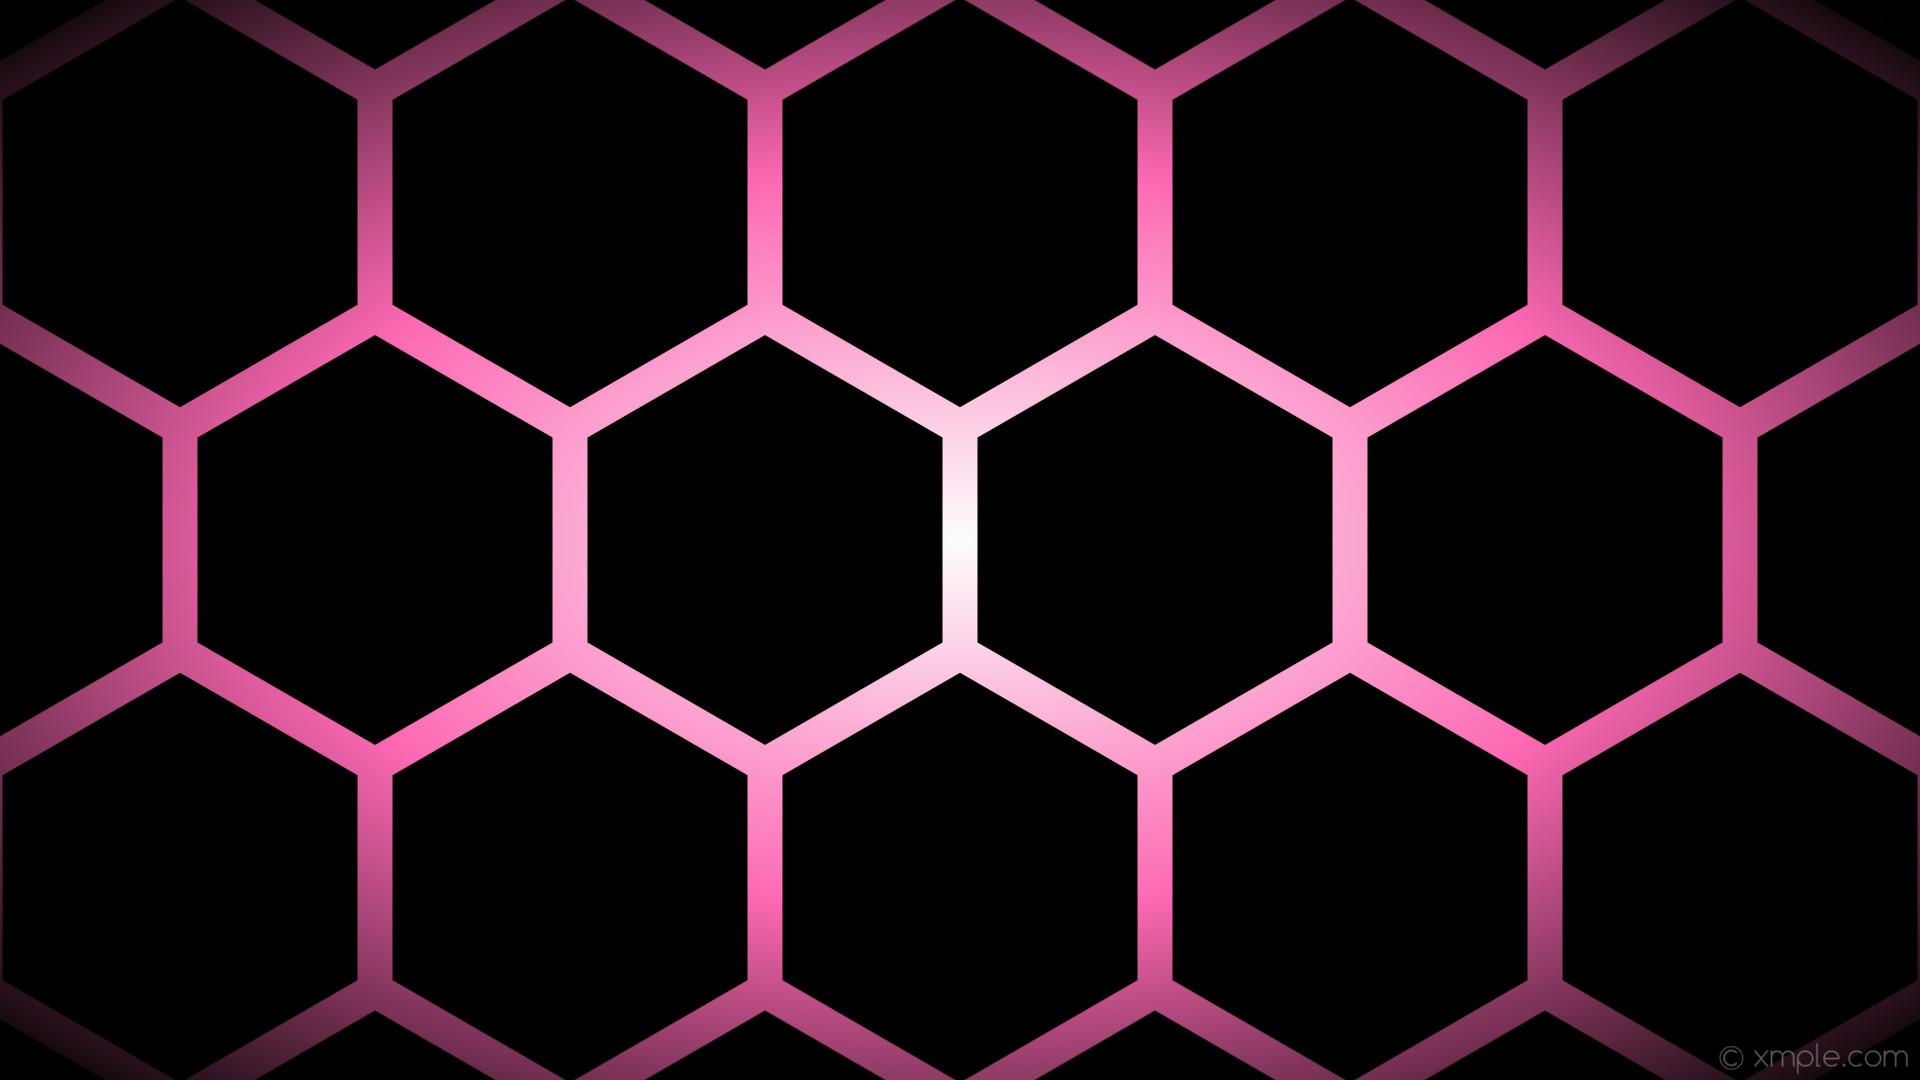 wallpaper glow hexagon black pink white gradient hot pink #000000 #ffffff  #ff69b4 0